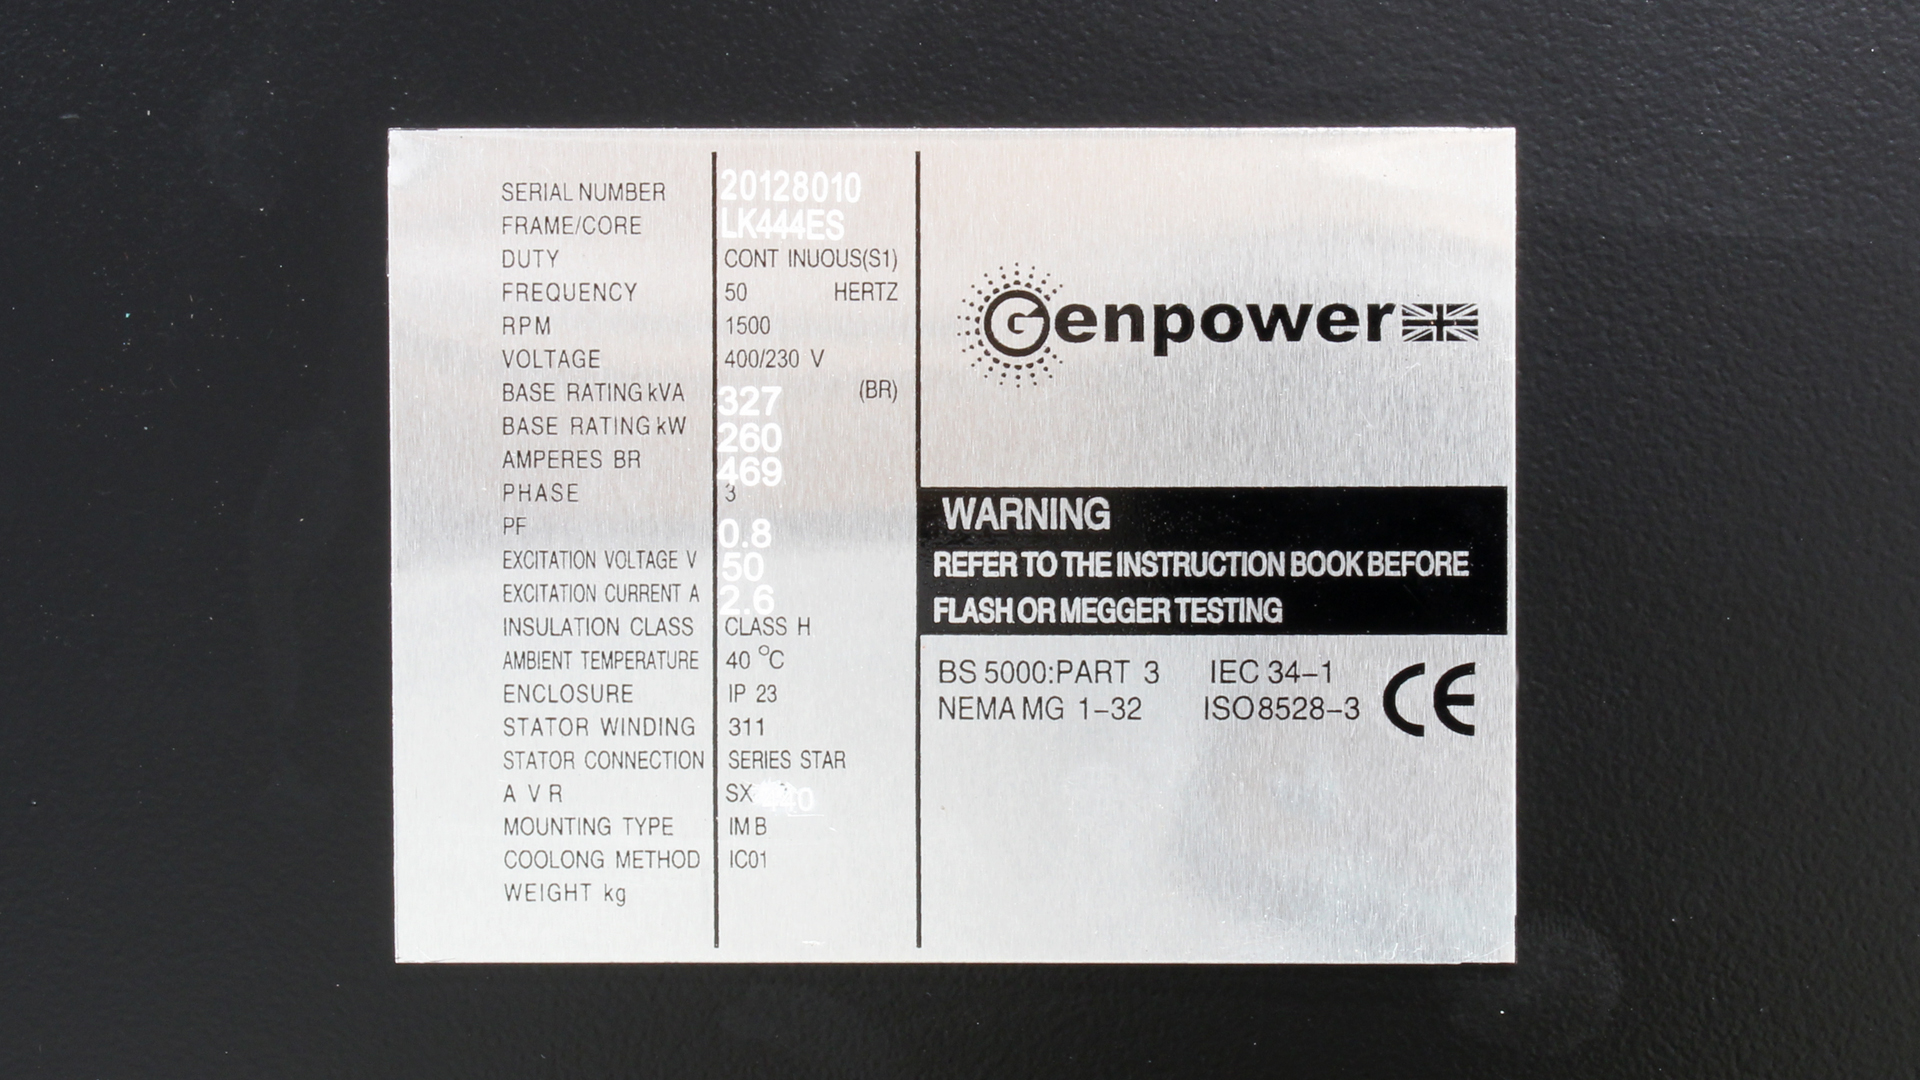 Genpower LK444ES 360kVA Alternator Spec Plate